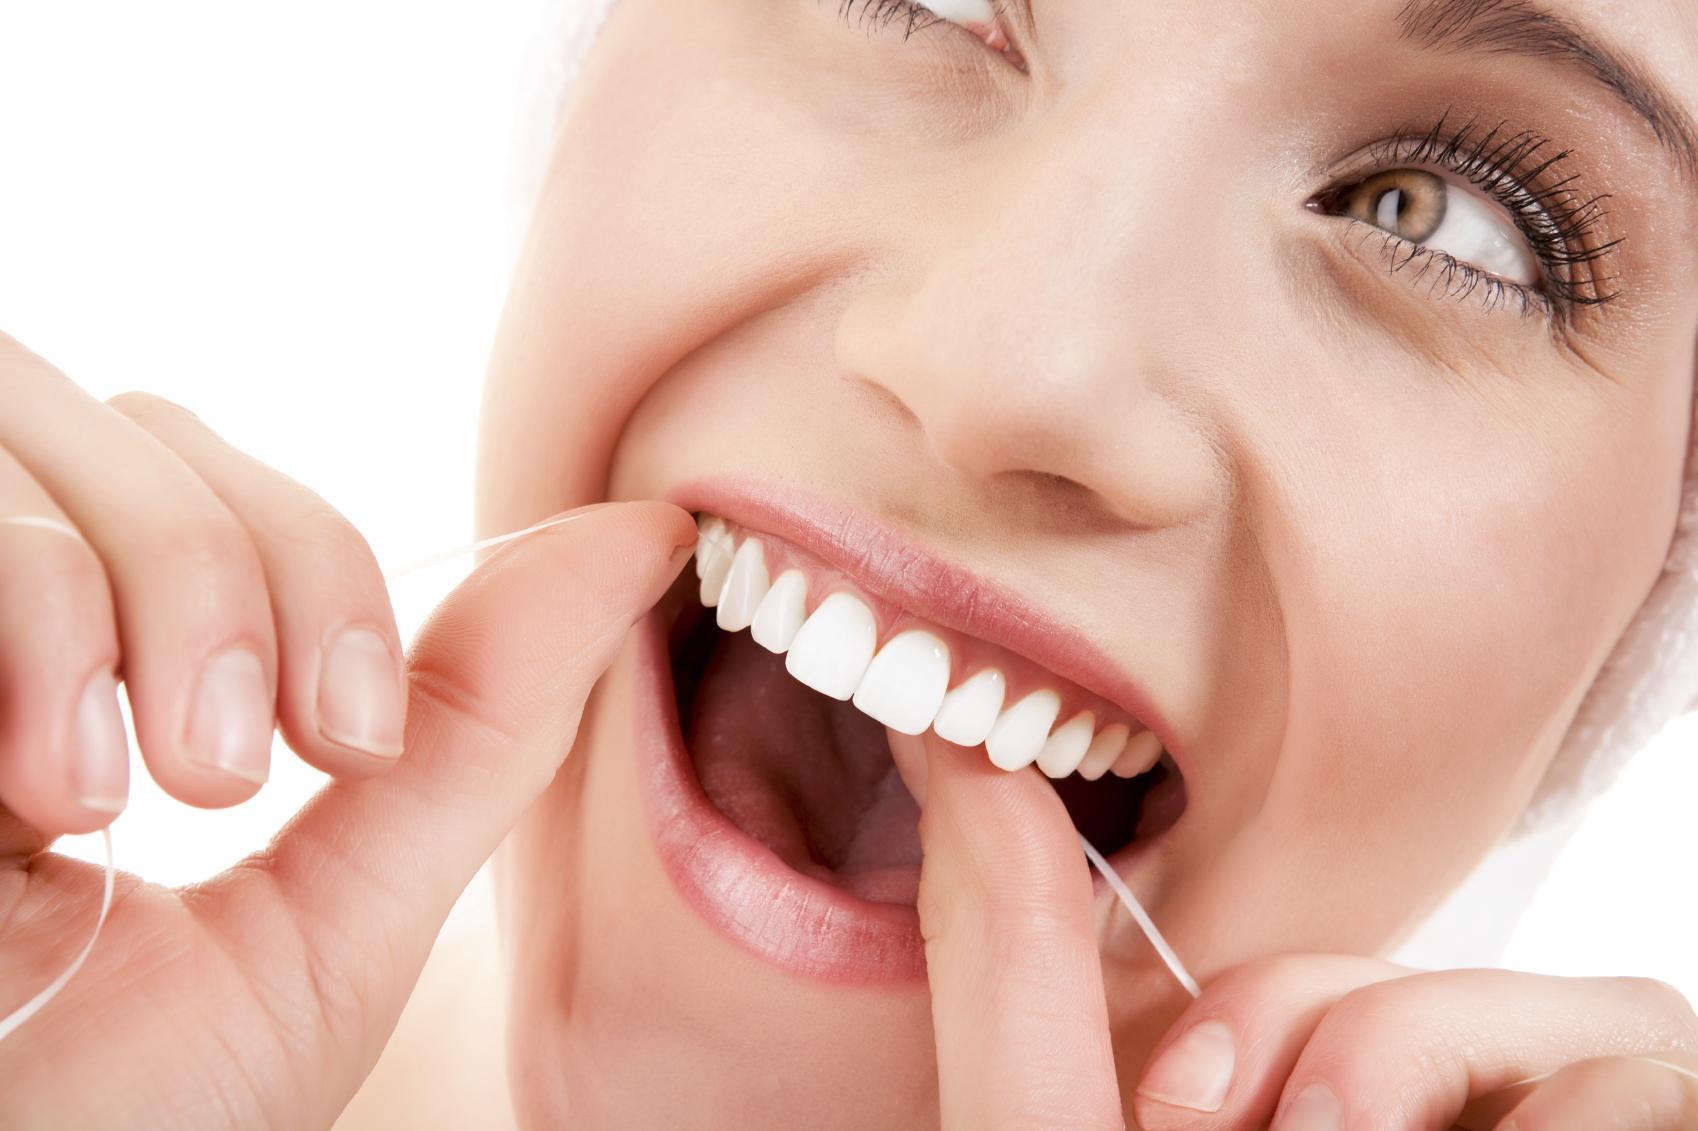 e16f6e717 Passar Fio dental é importante  mito ou realidade